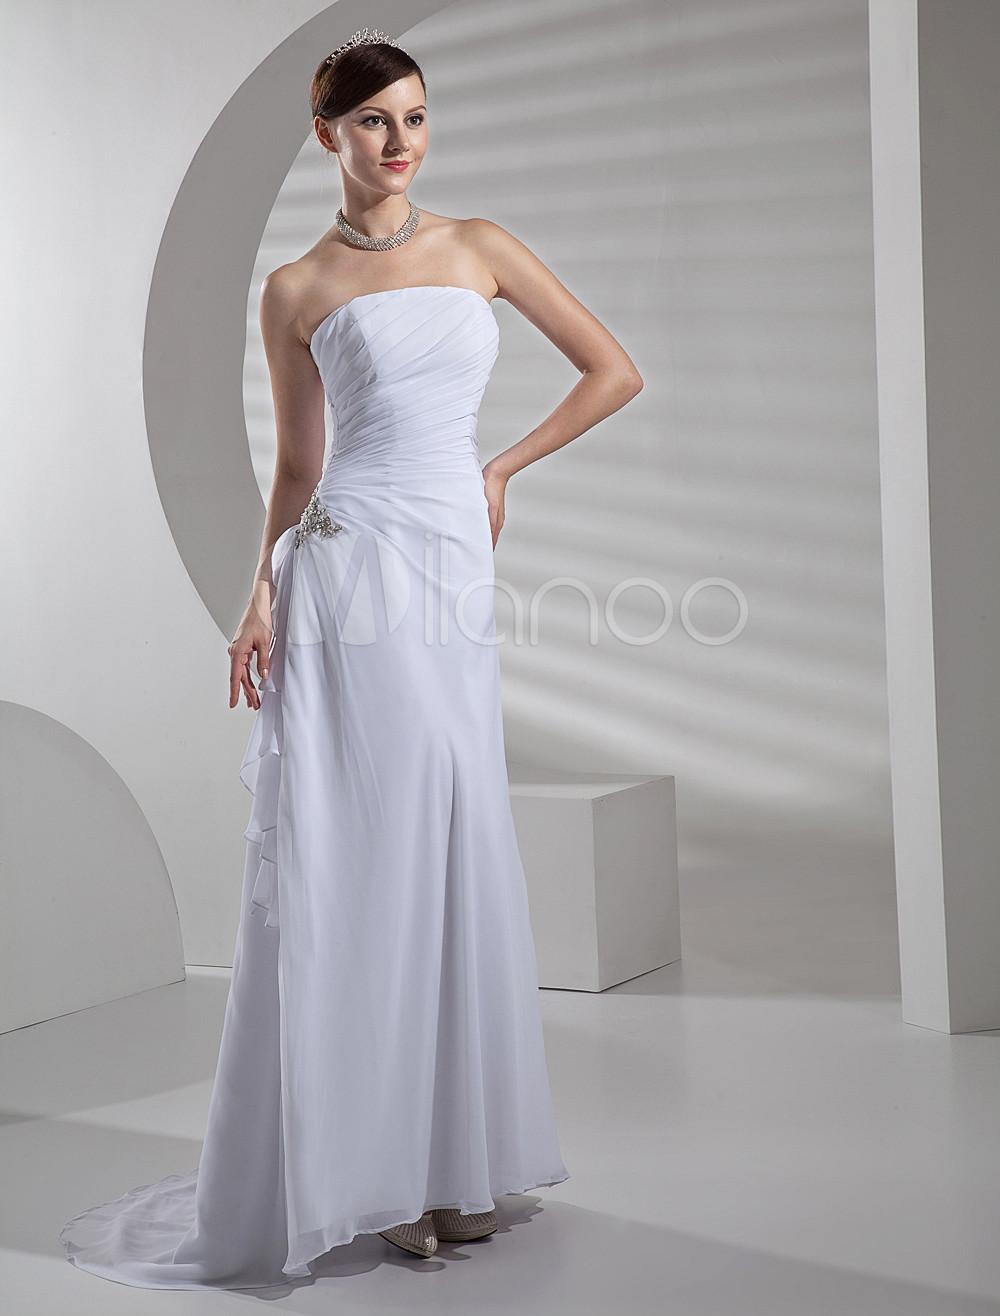 White Satin Chiffon A Line Wedding Dress